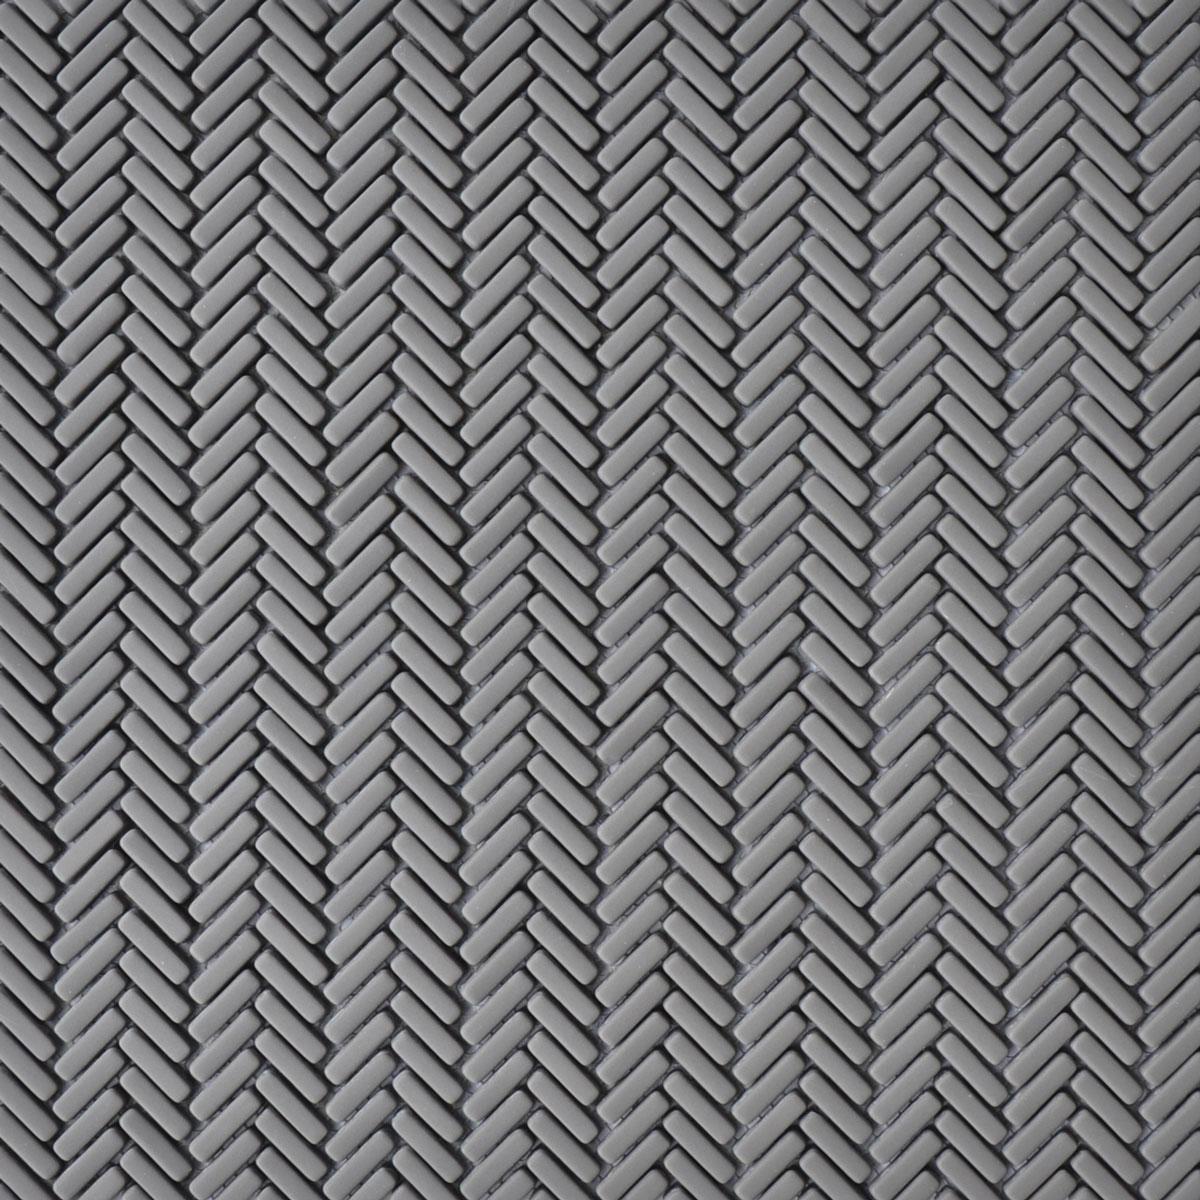 Copy of Herringbone, $25.95 / sq.ft.